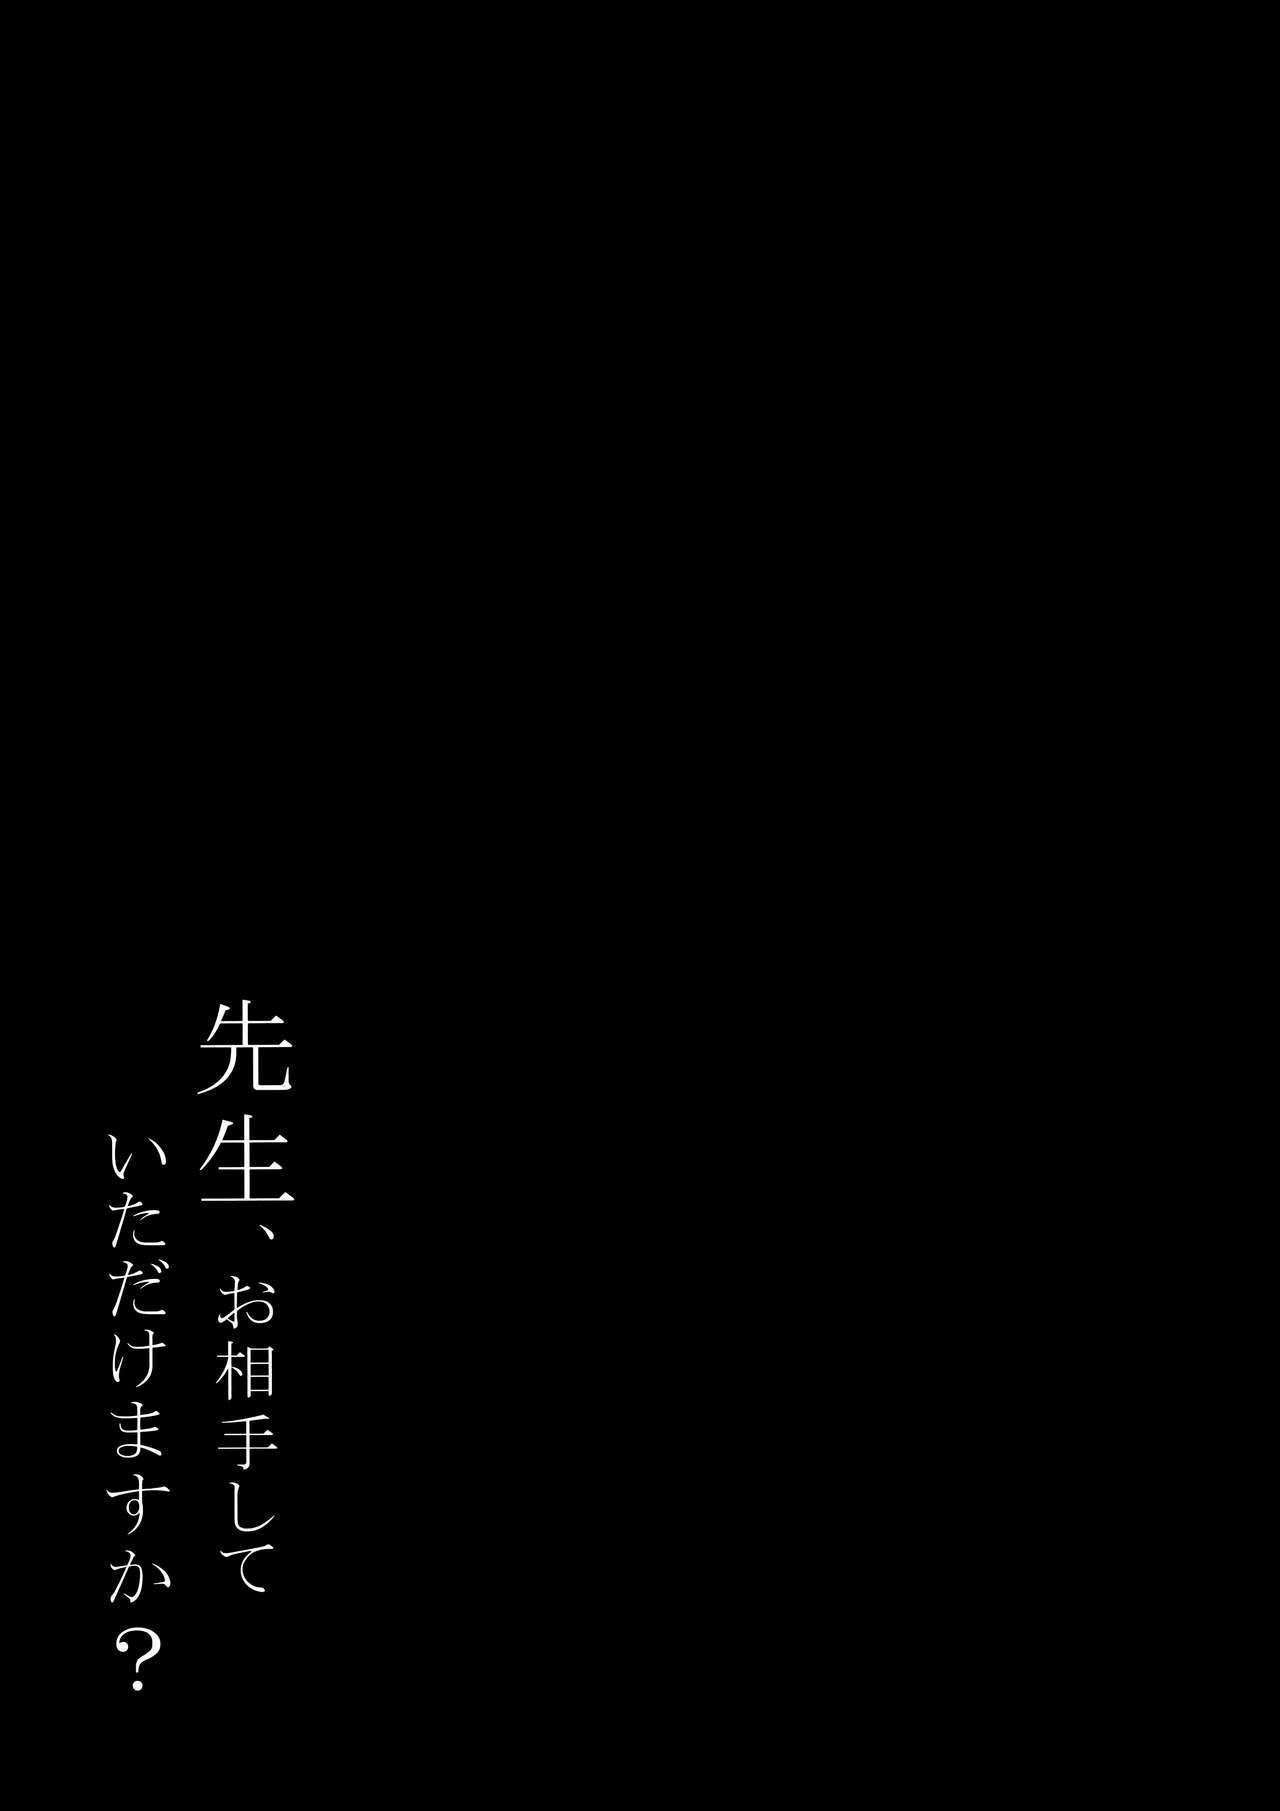 Sensei, Oaite Shiteitadakemasuka? 20